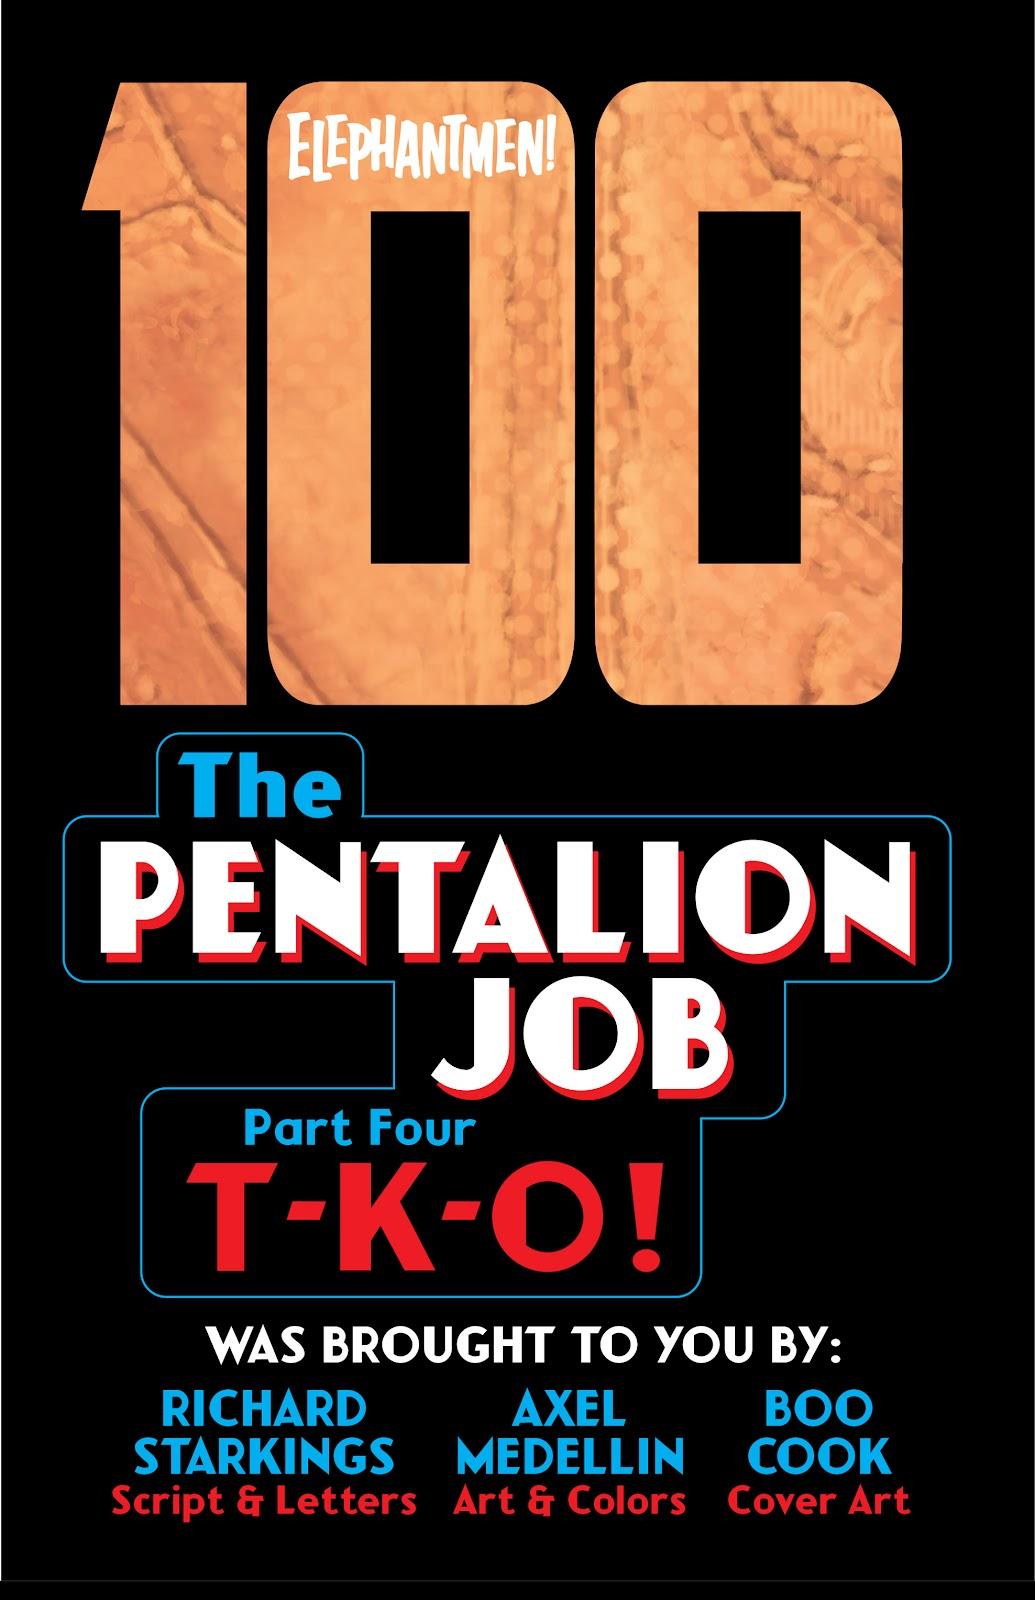 Read online Elephantmen 2261 Season Two: The Pentalion Job comic -  Issue # TPB - 94